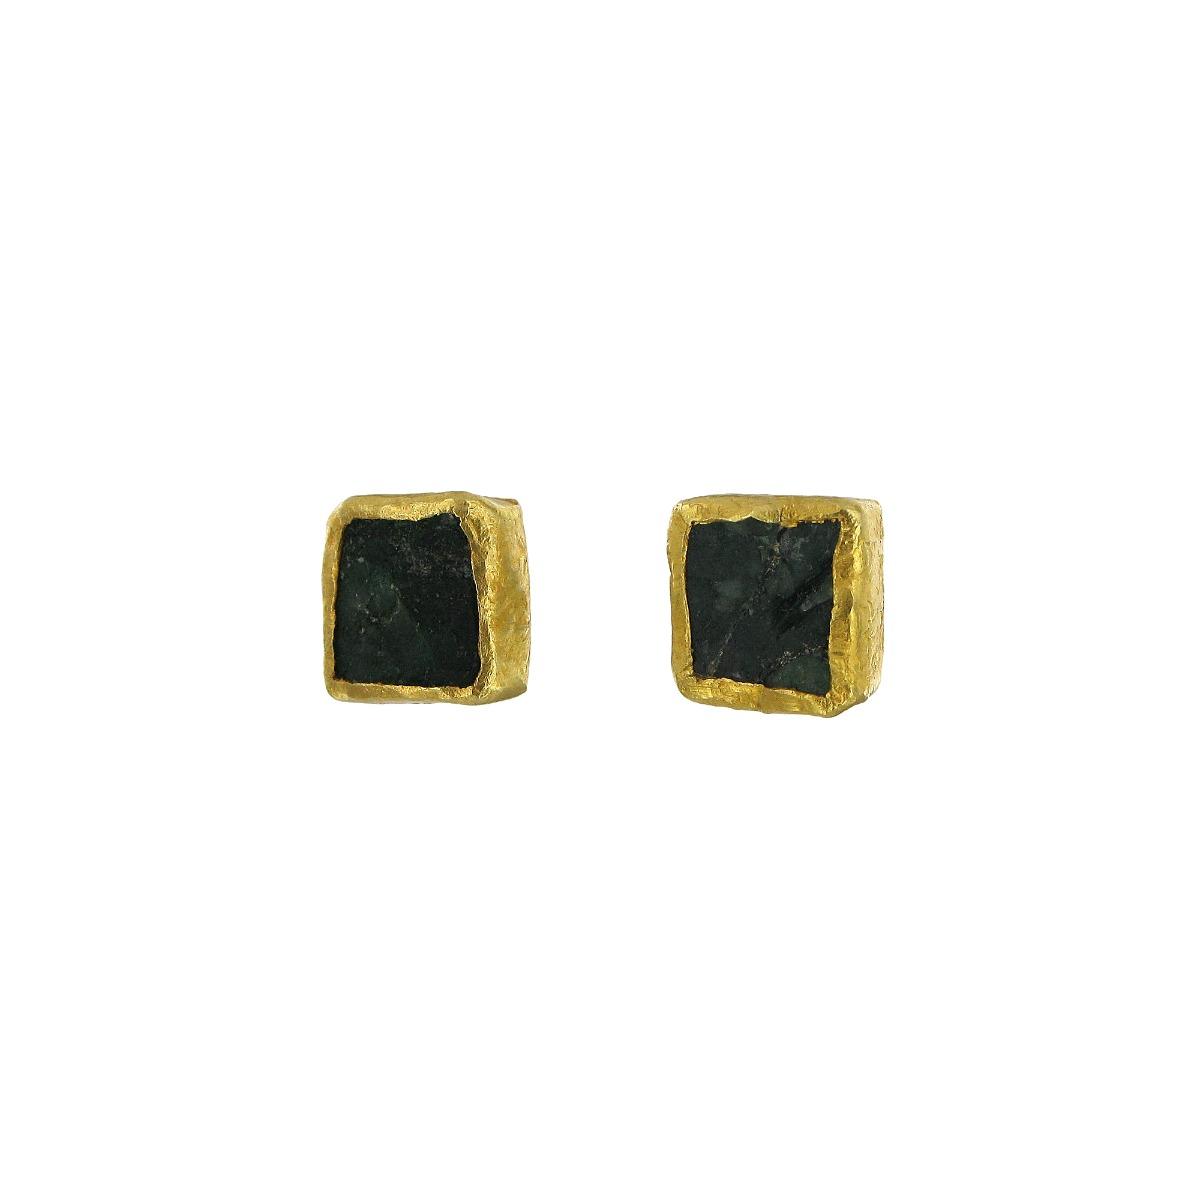 Brazilian emerald square stud earrings